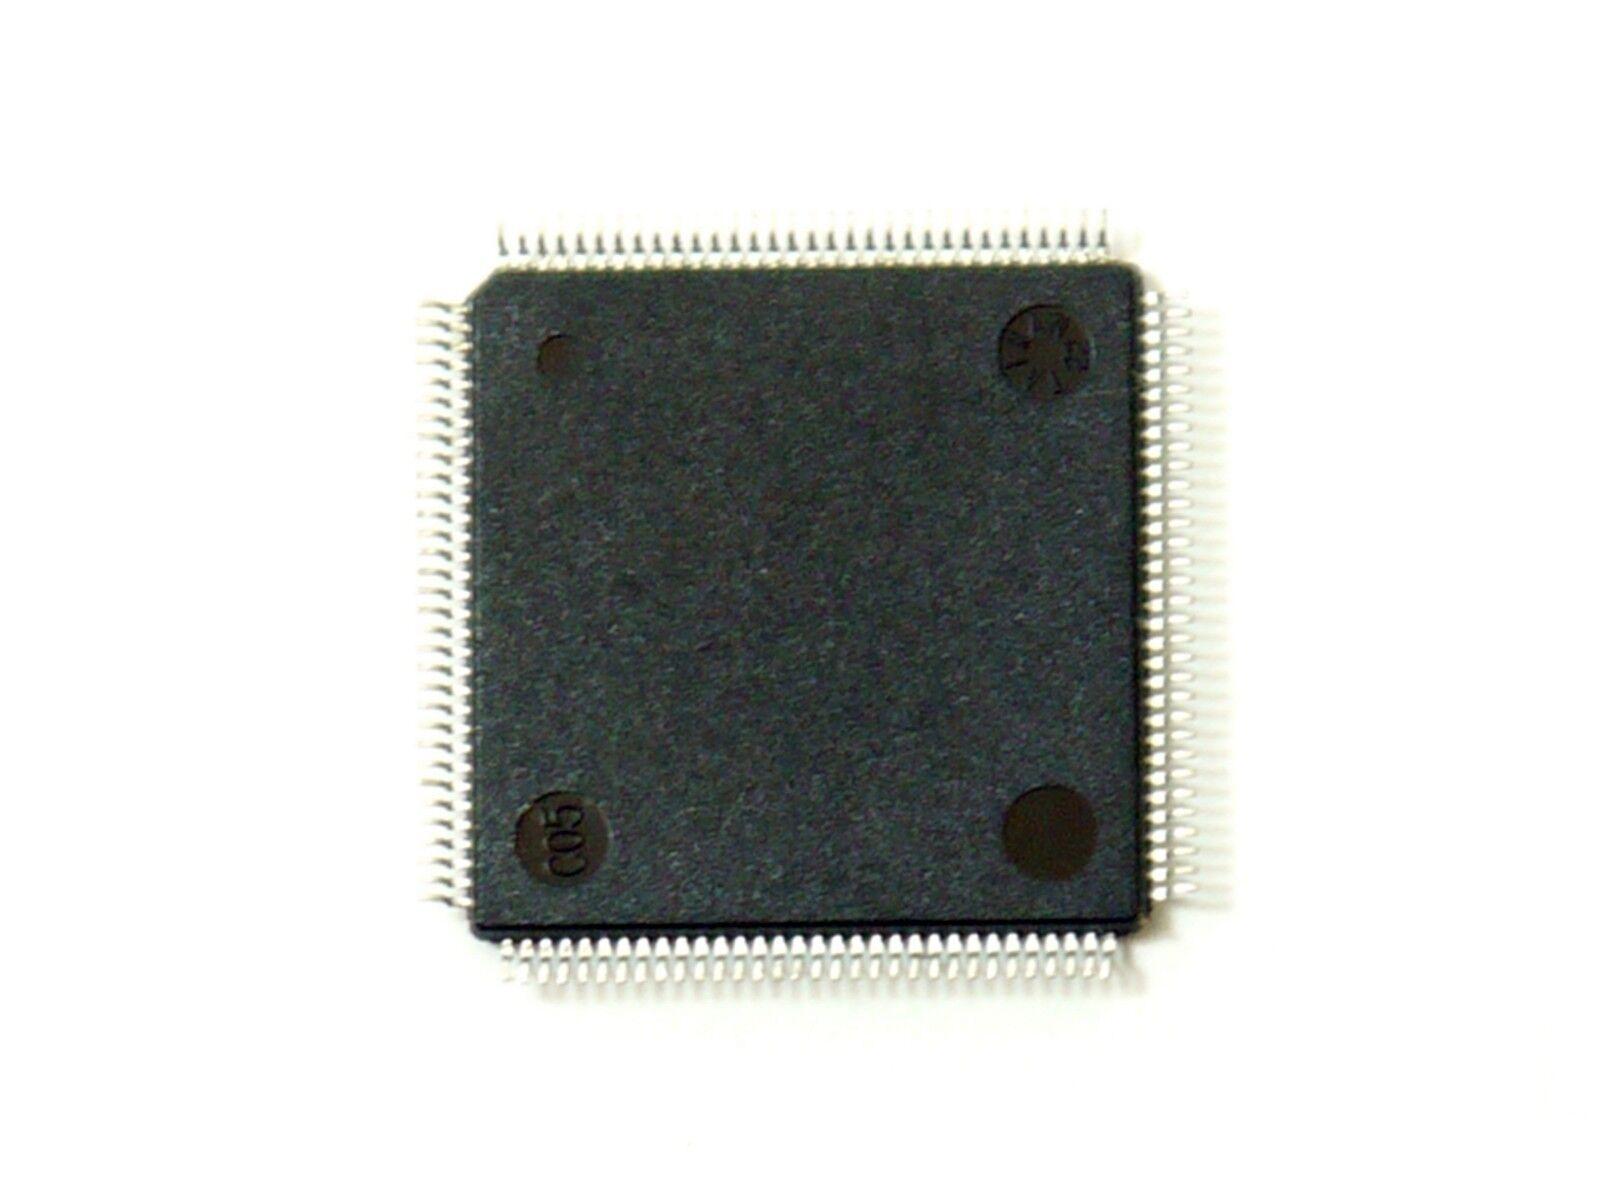 Lot of iTE IT8995E-128-CXS IT8995E 128 CXS TQFP EC Power IC Chip Chipset